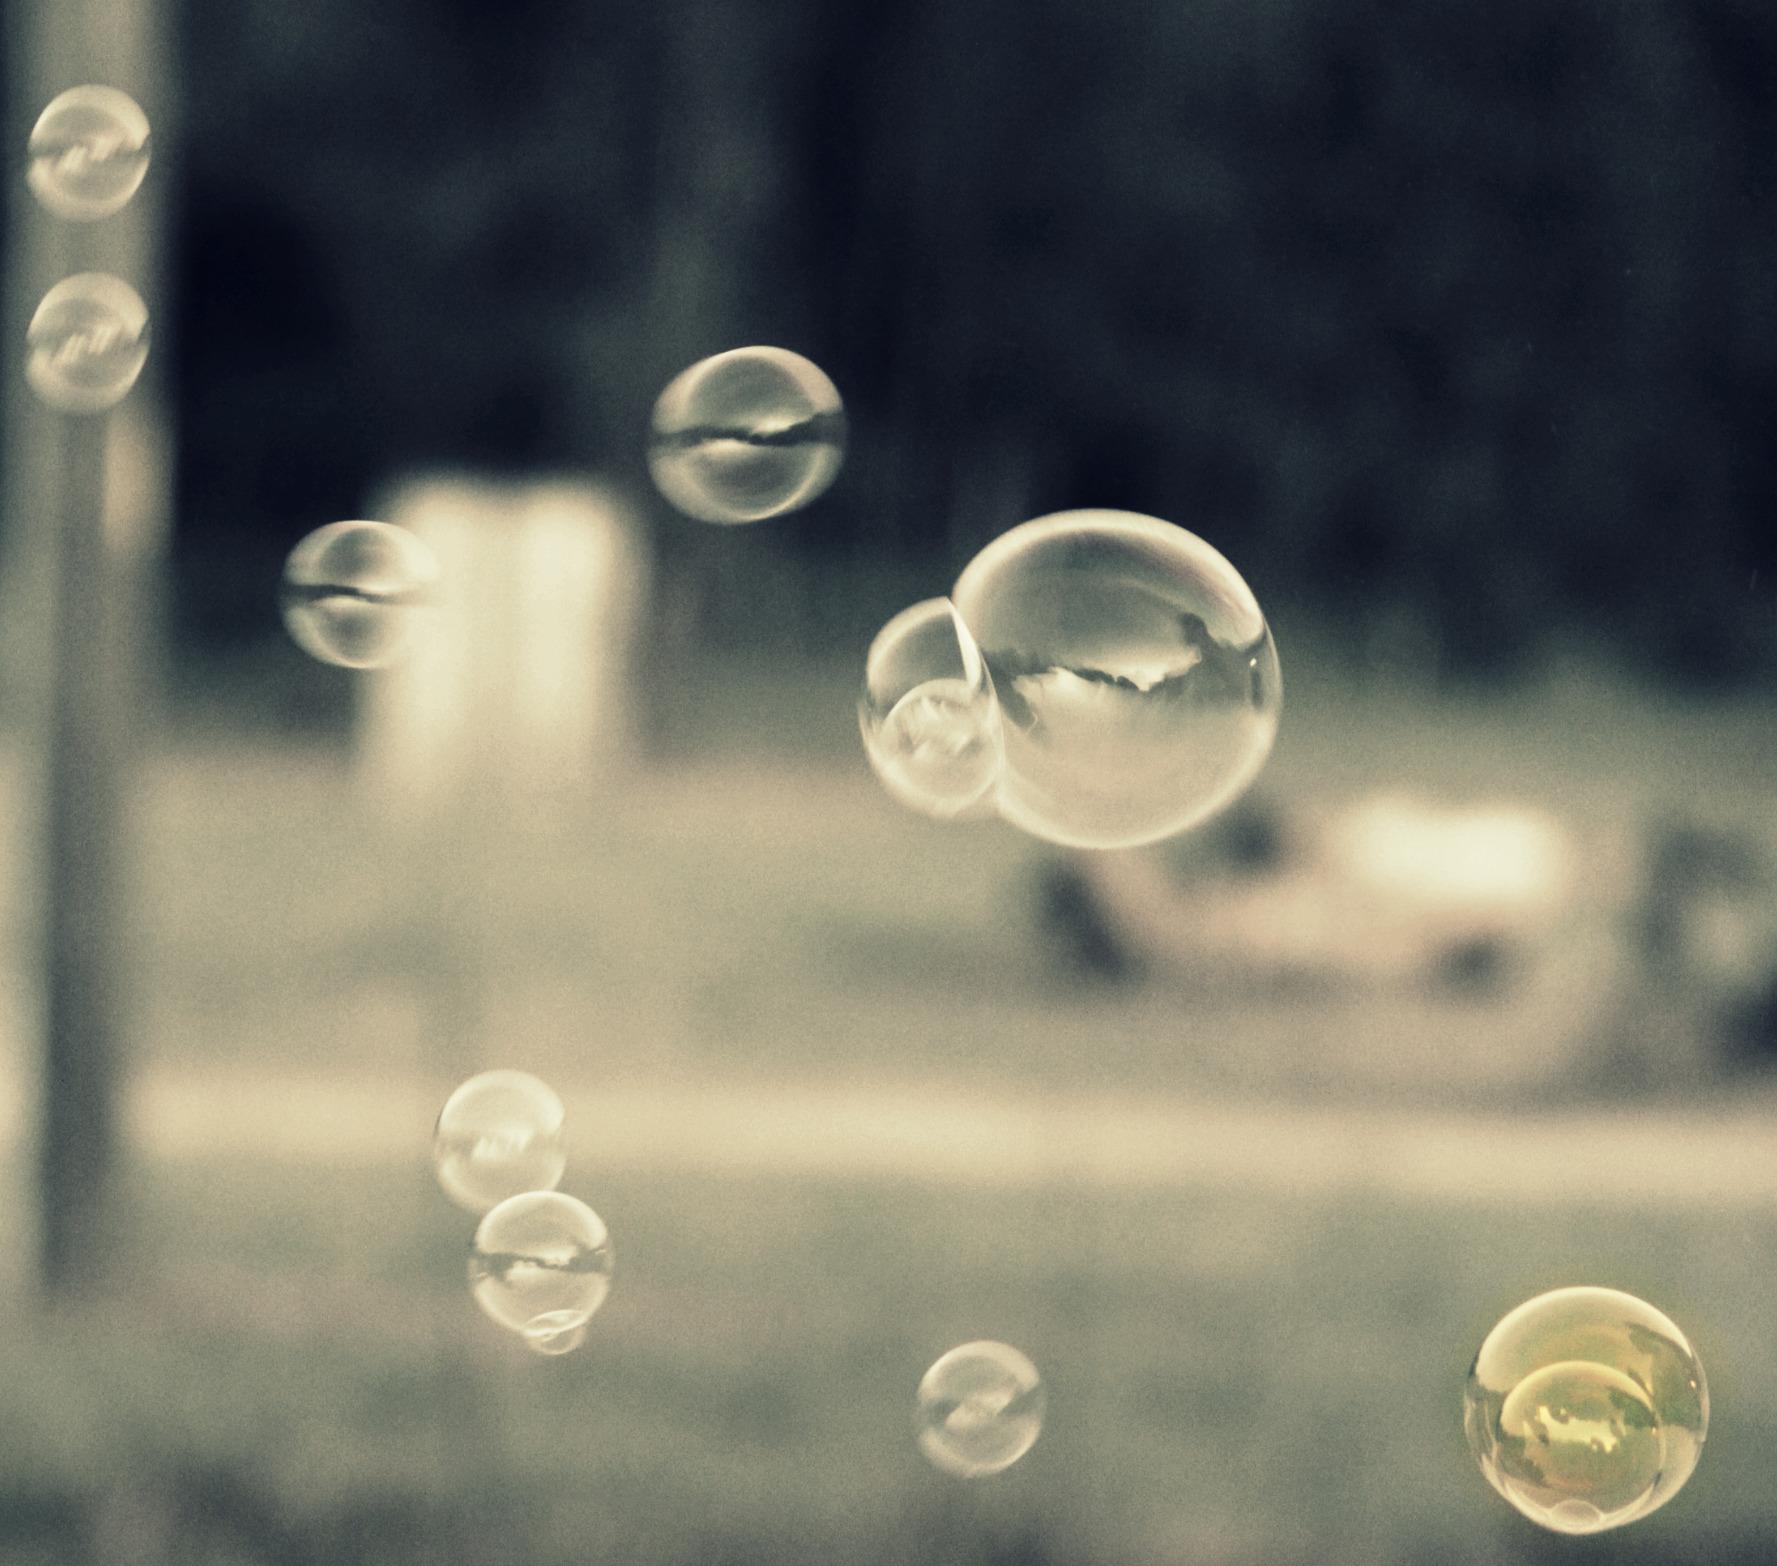 Startup bubble 2.0?